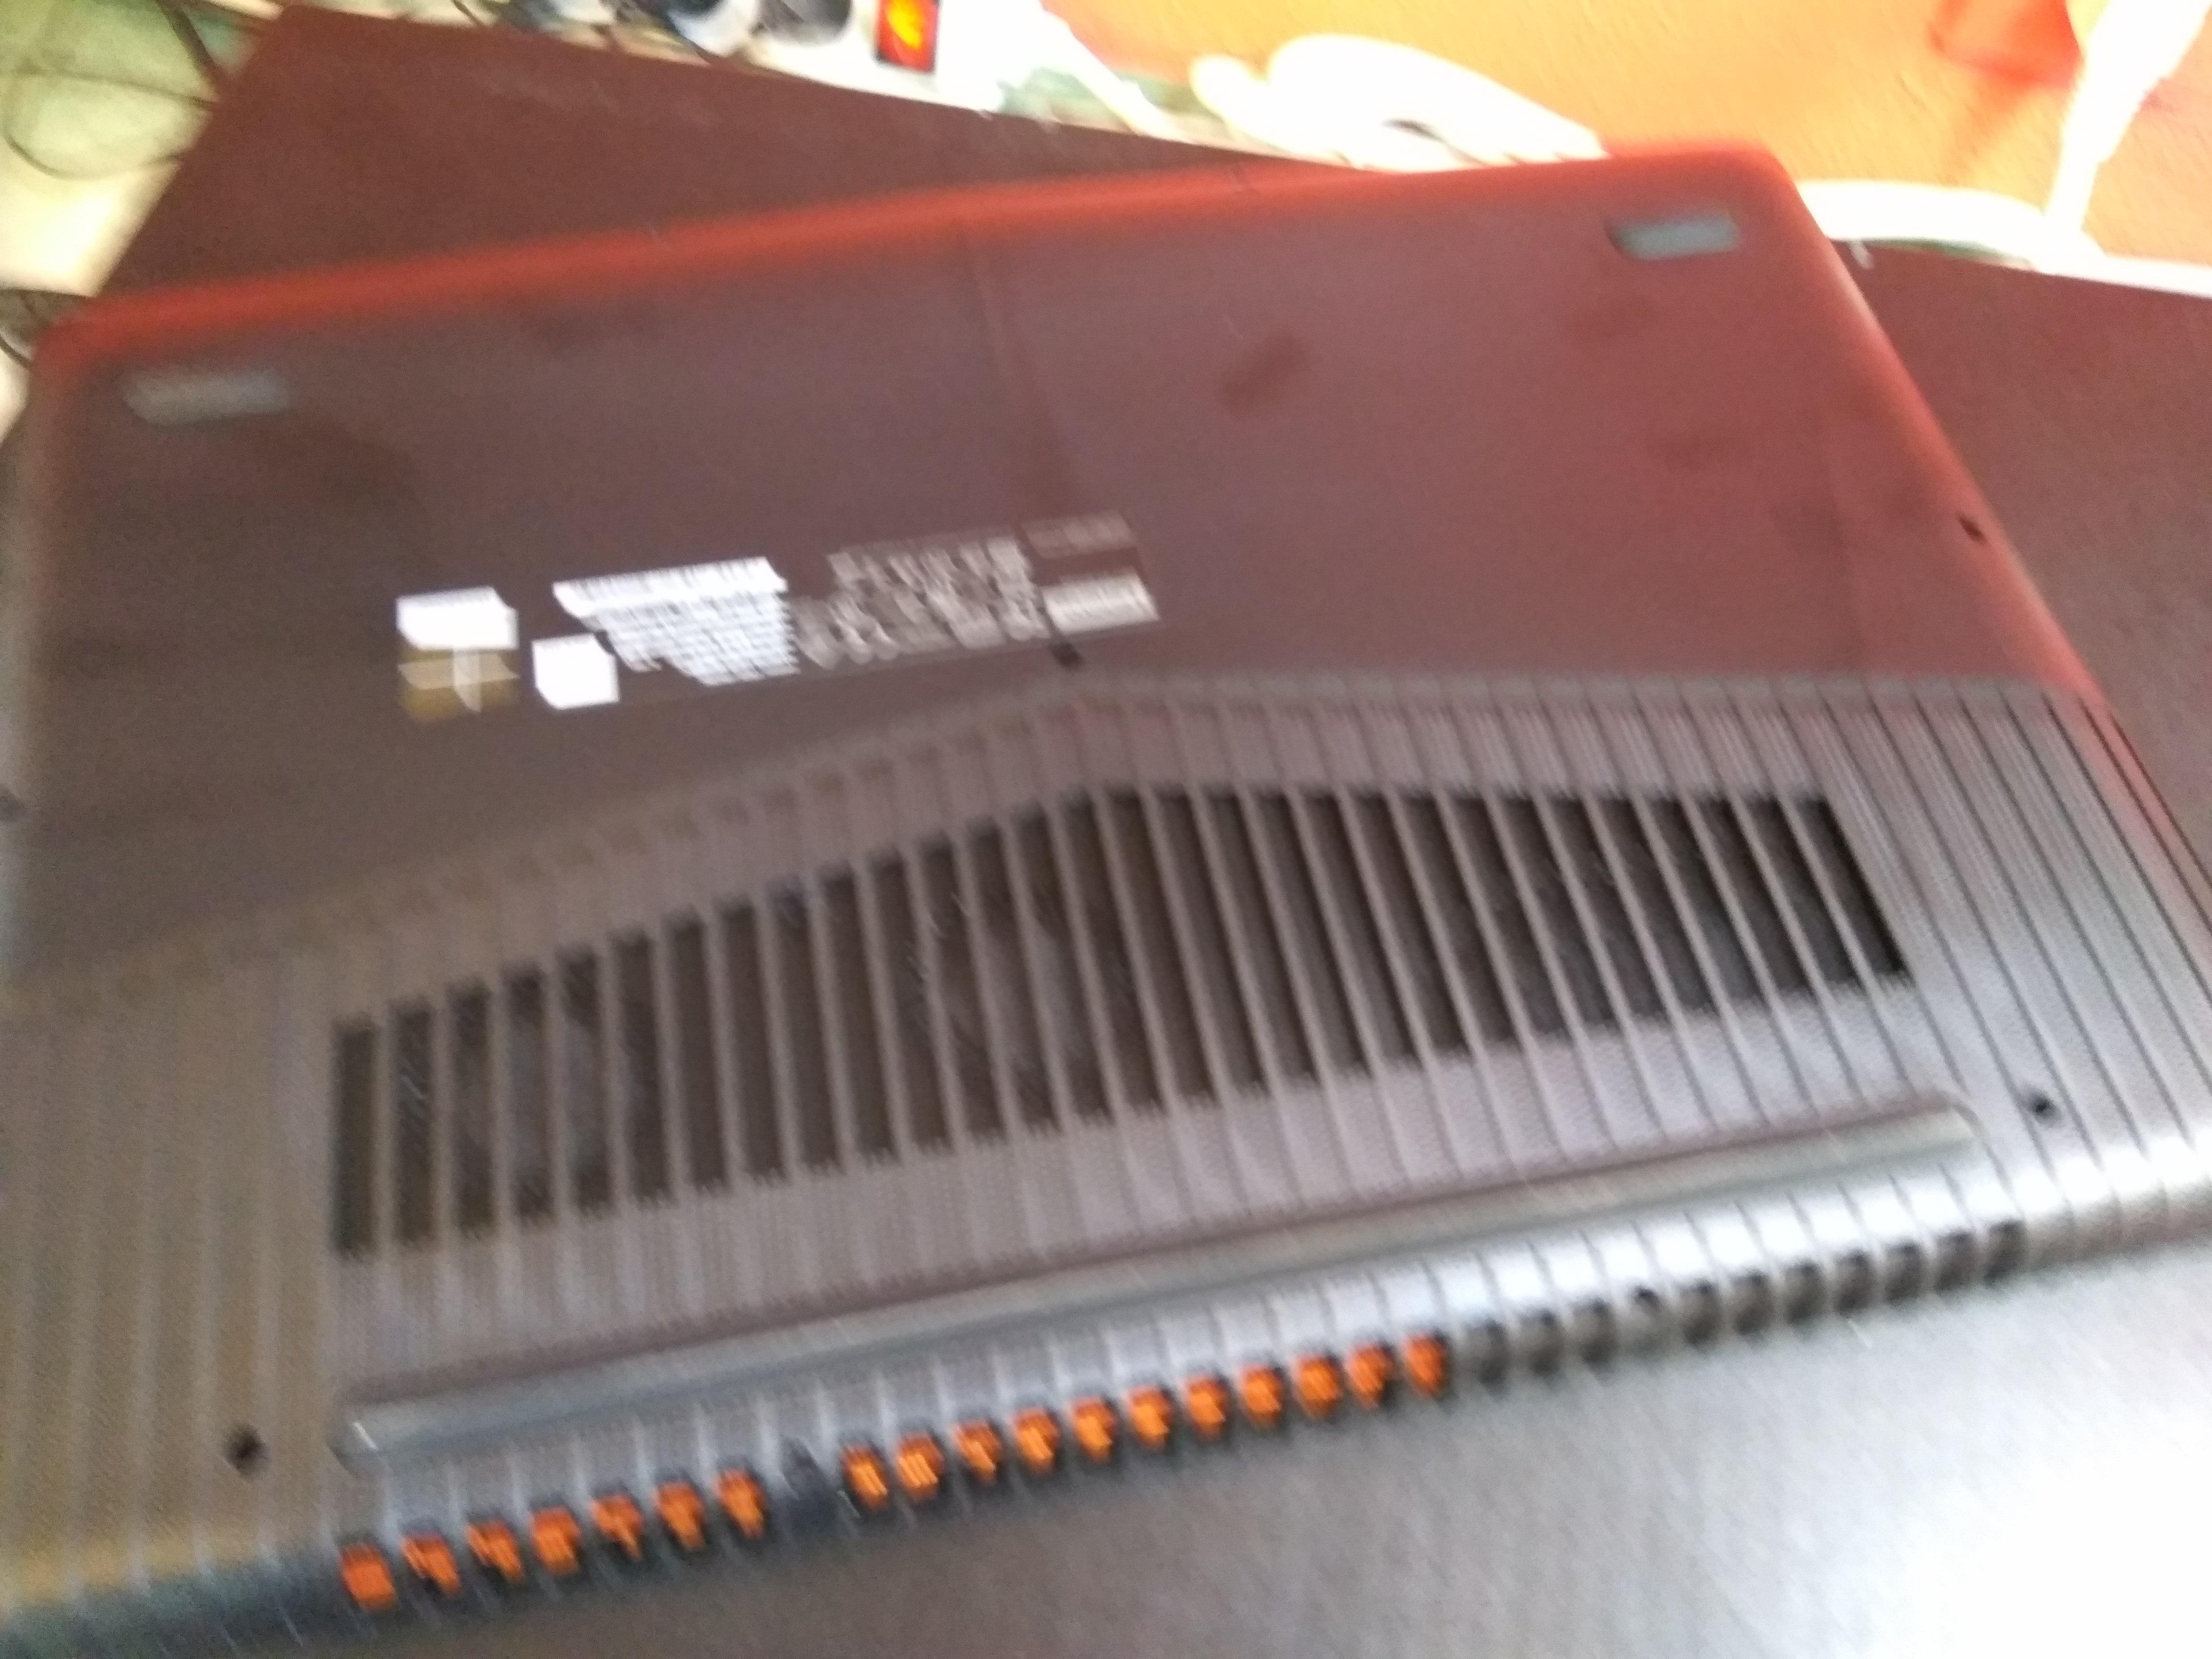 Piękny stylowy Lenovo Legion Y520 🙂